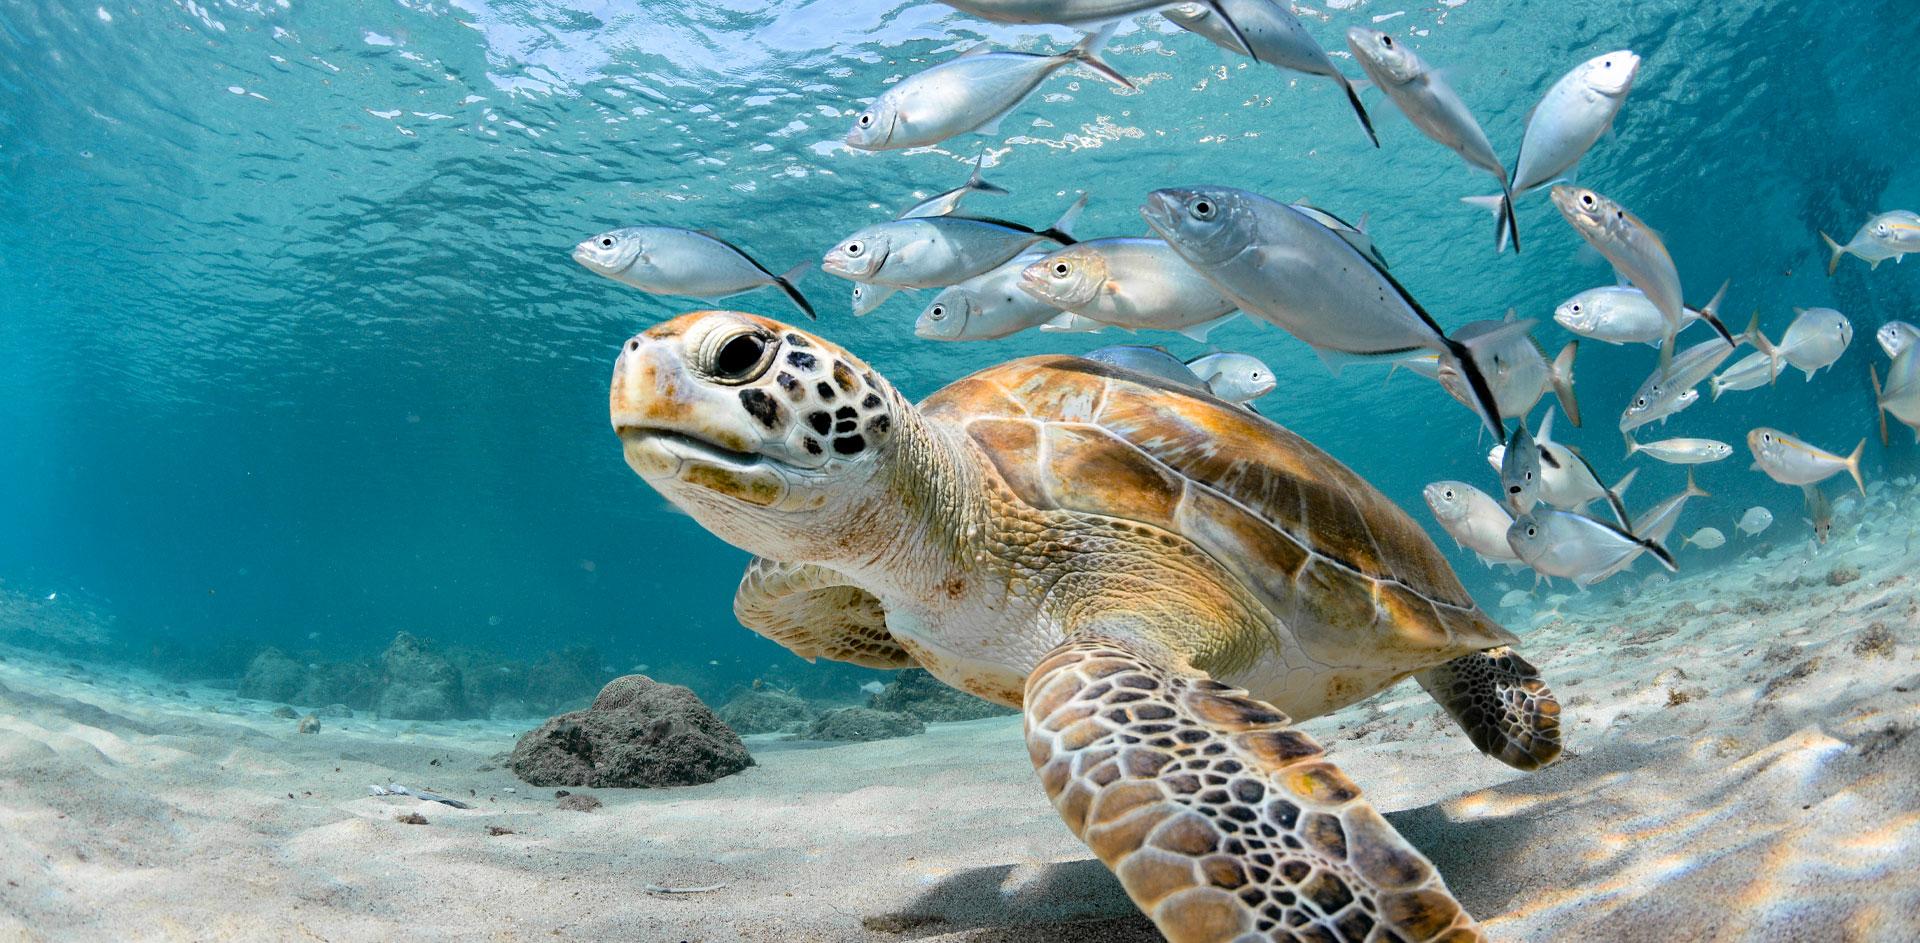 Tartaruga nuota in un oceano pulito